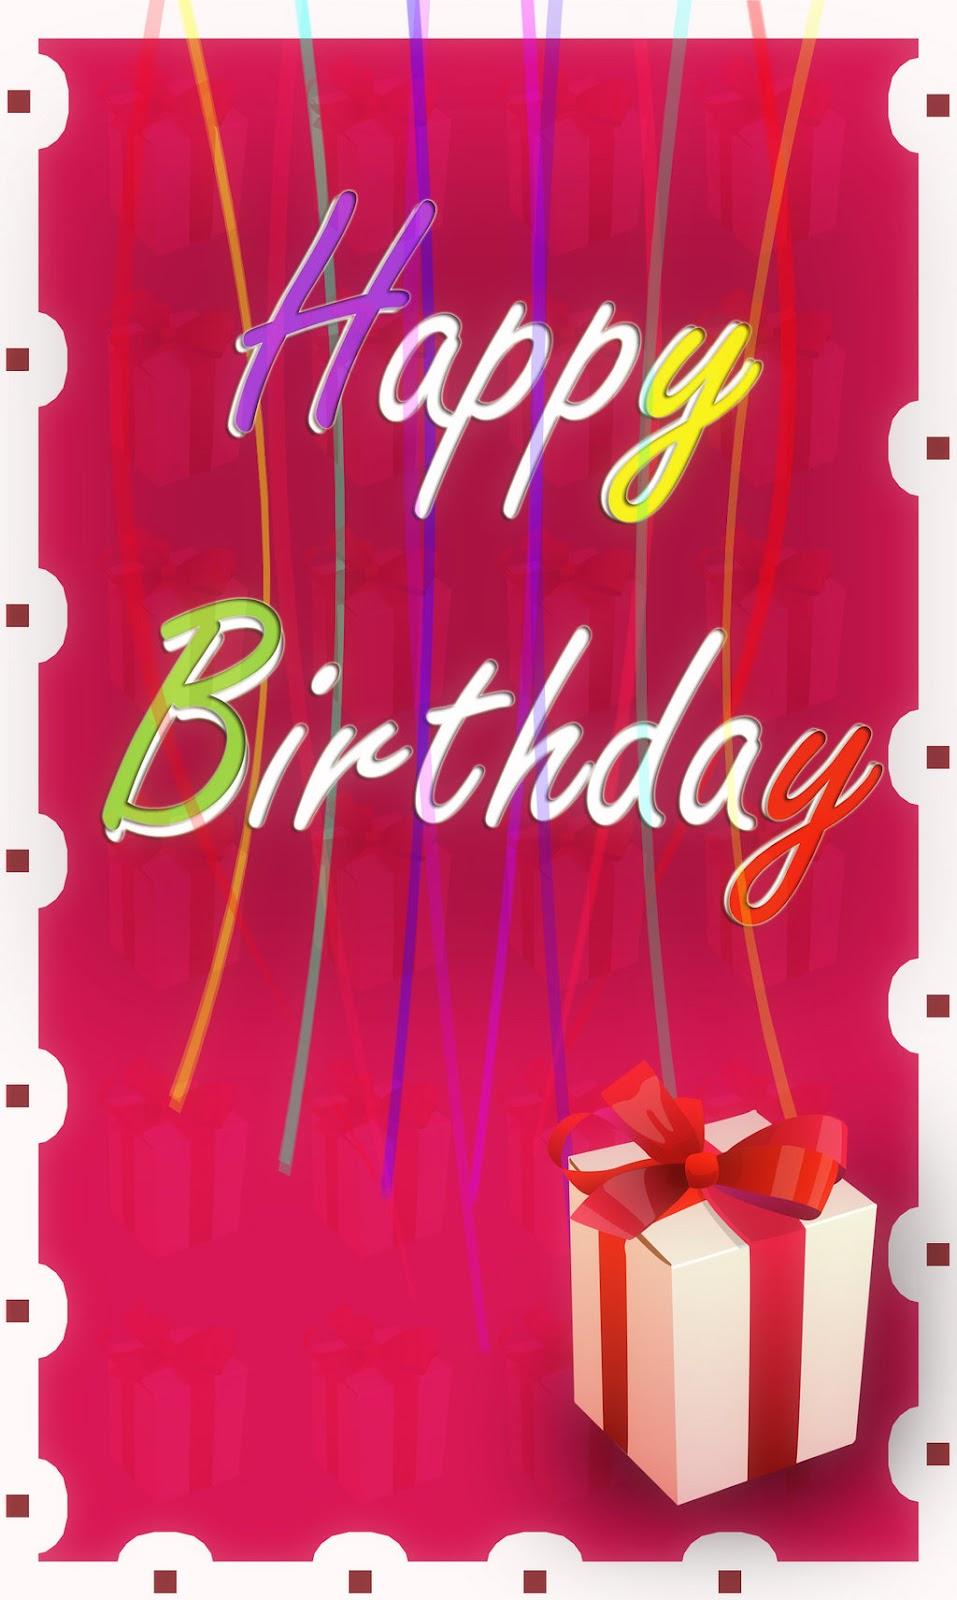 cinemaa happy birthday wishes